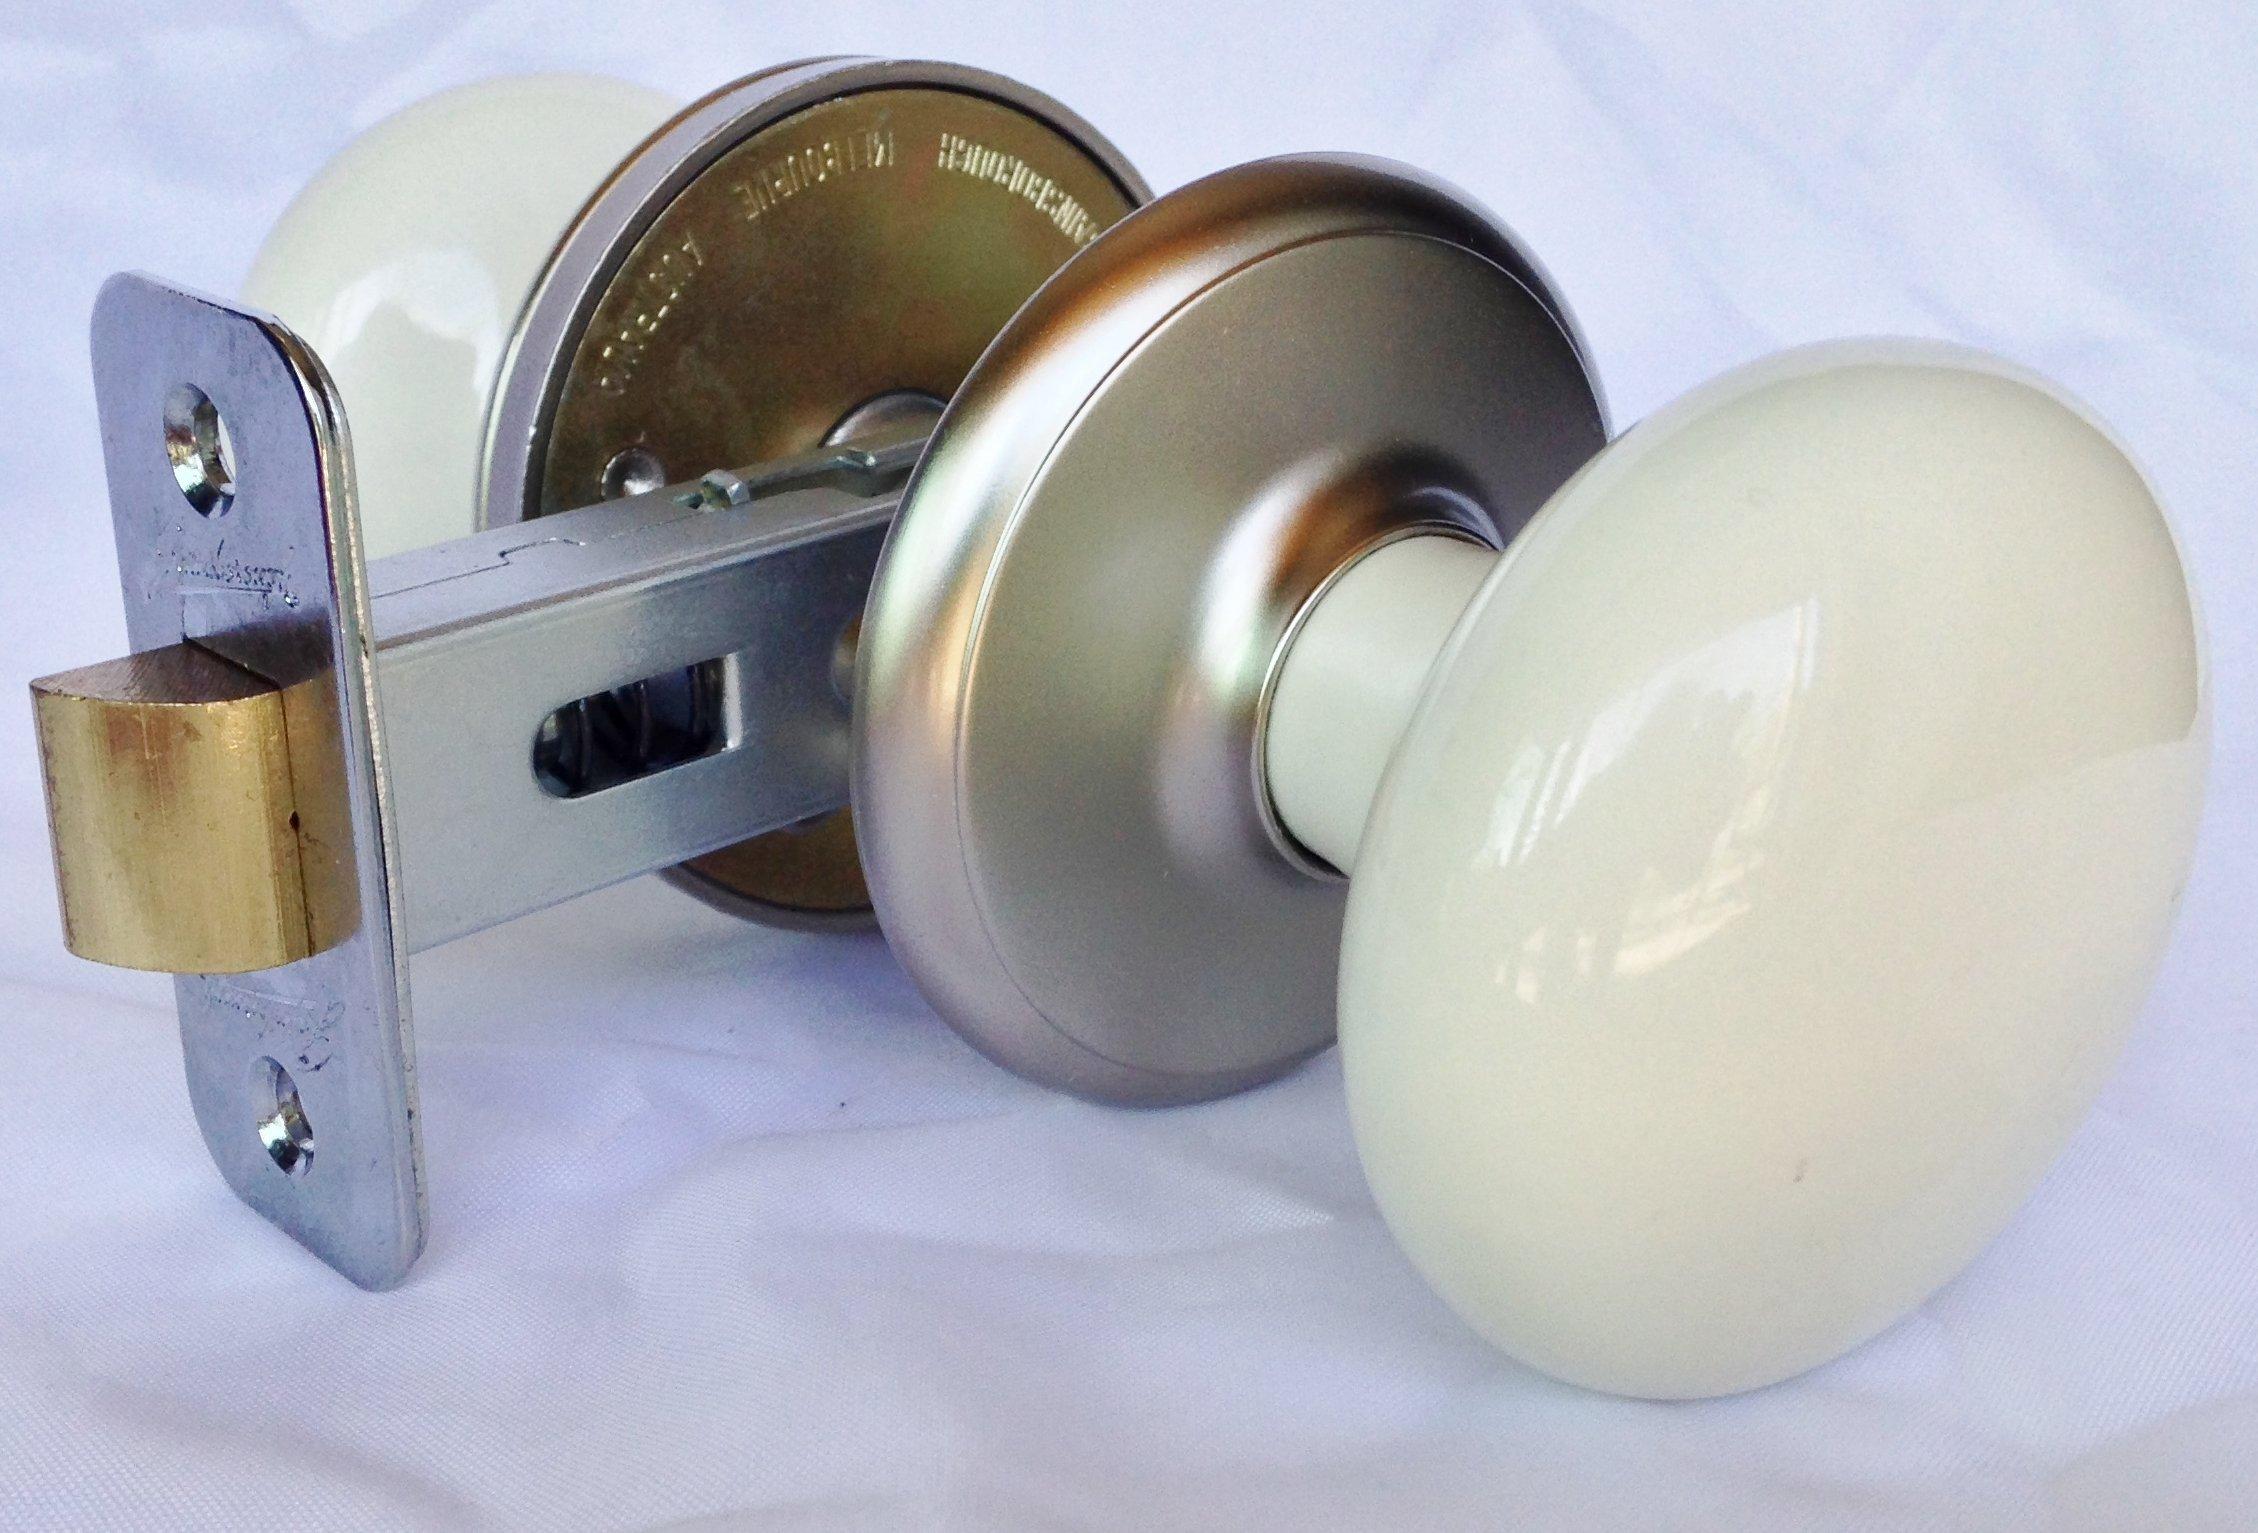 Ultra Hardware 88577 Gainsborough Porcelain Hall-Closet Door Knob, Satin Nickel by Ultra Hardware (Image #1)